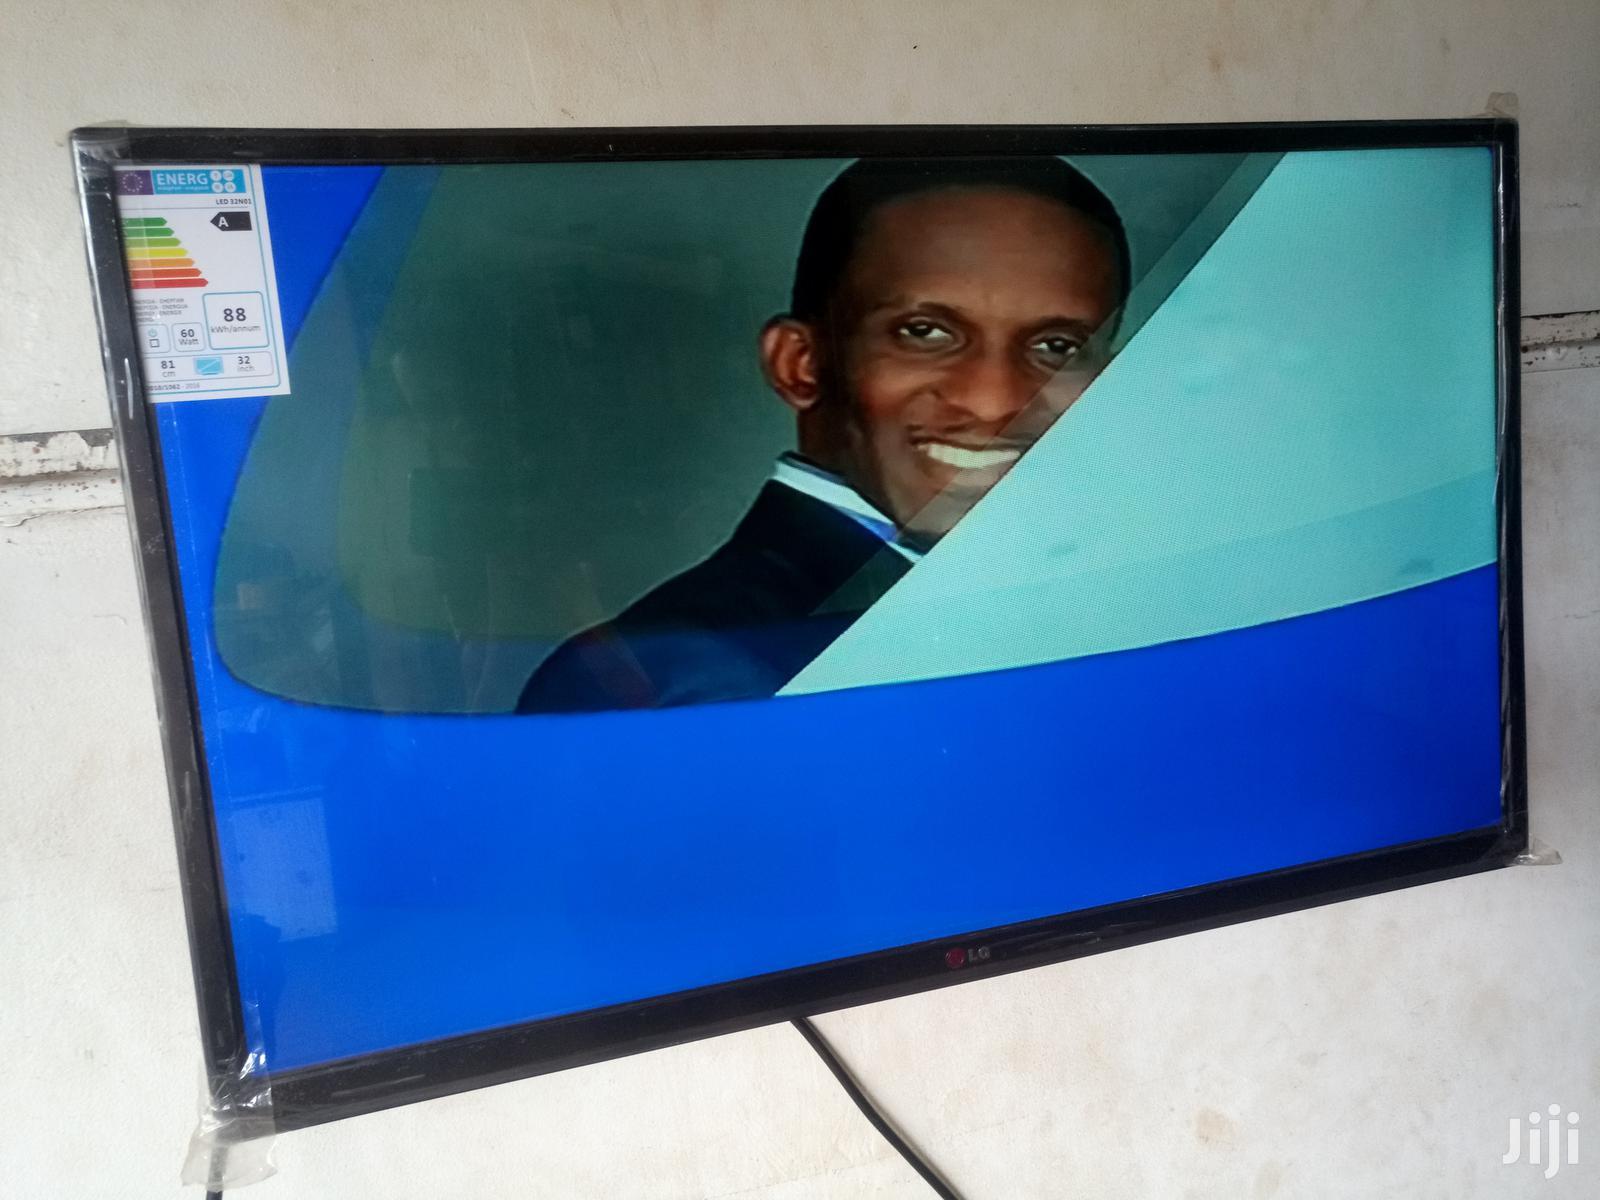 LG LED Flat Screen Digital TV 32 Inches   TV & DVD Equipment for sale in Kampala, Central Region, Uganda